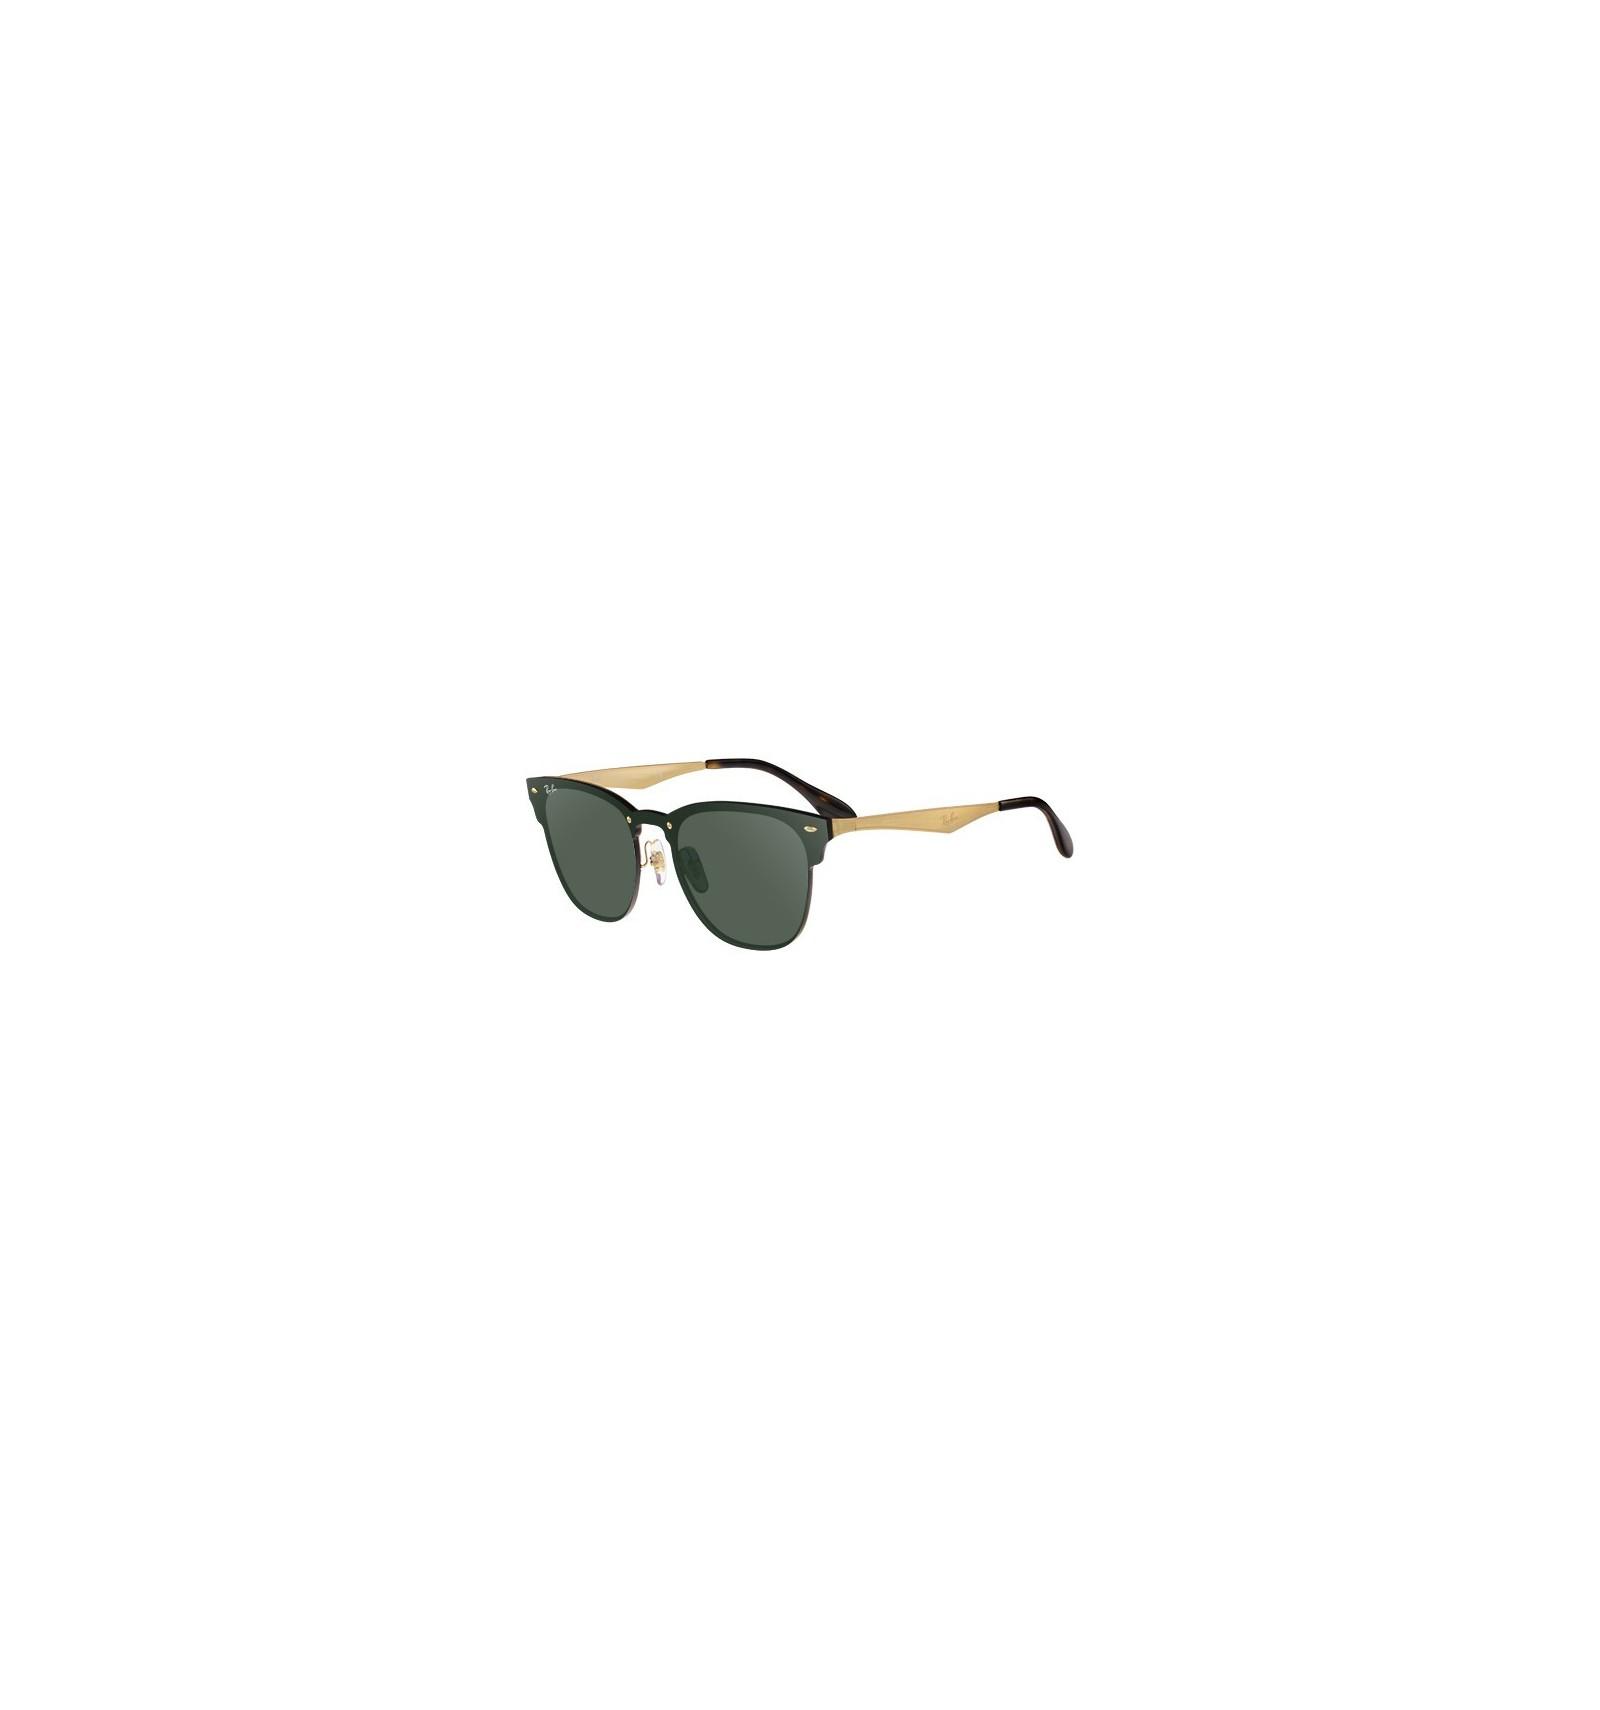 95d9a5f27f68e Gafas de sol RAY BAN RB3576 Blaze Clubmaster Gold - Green Mirror